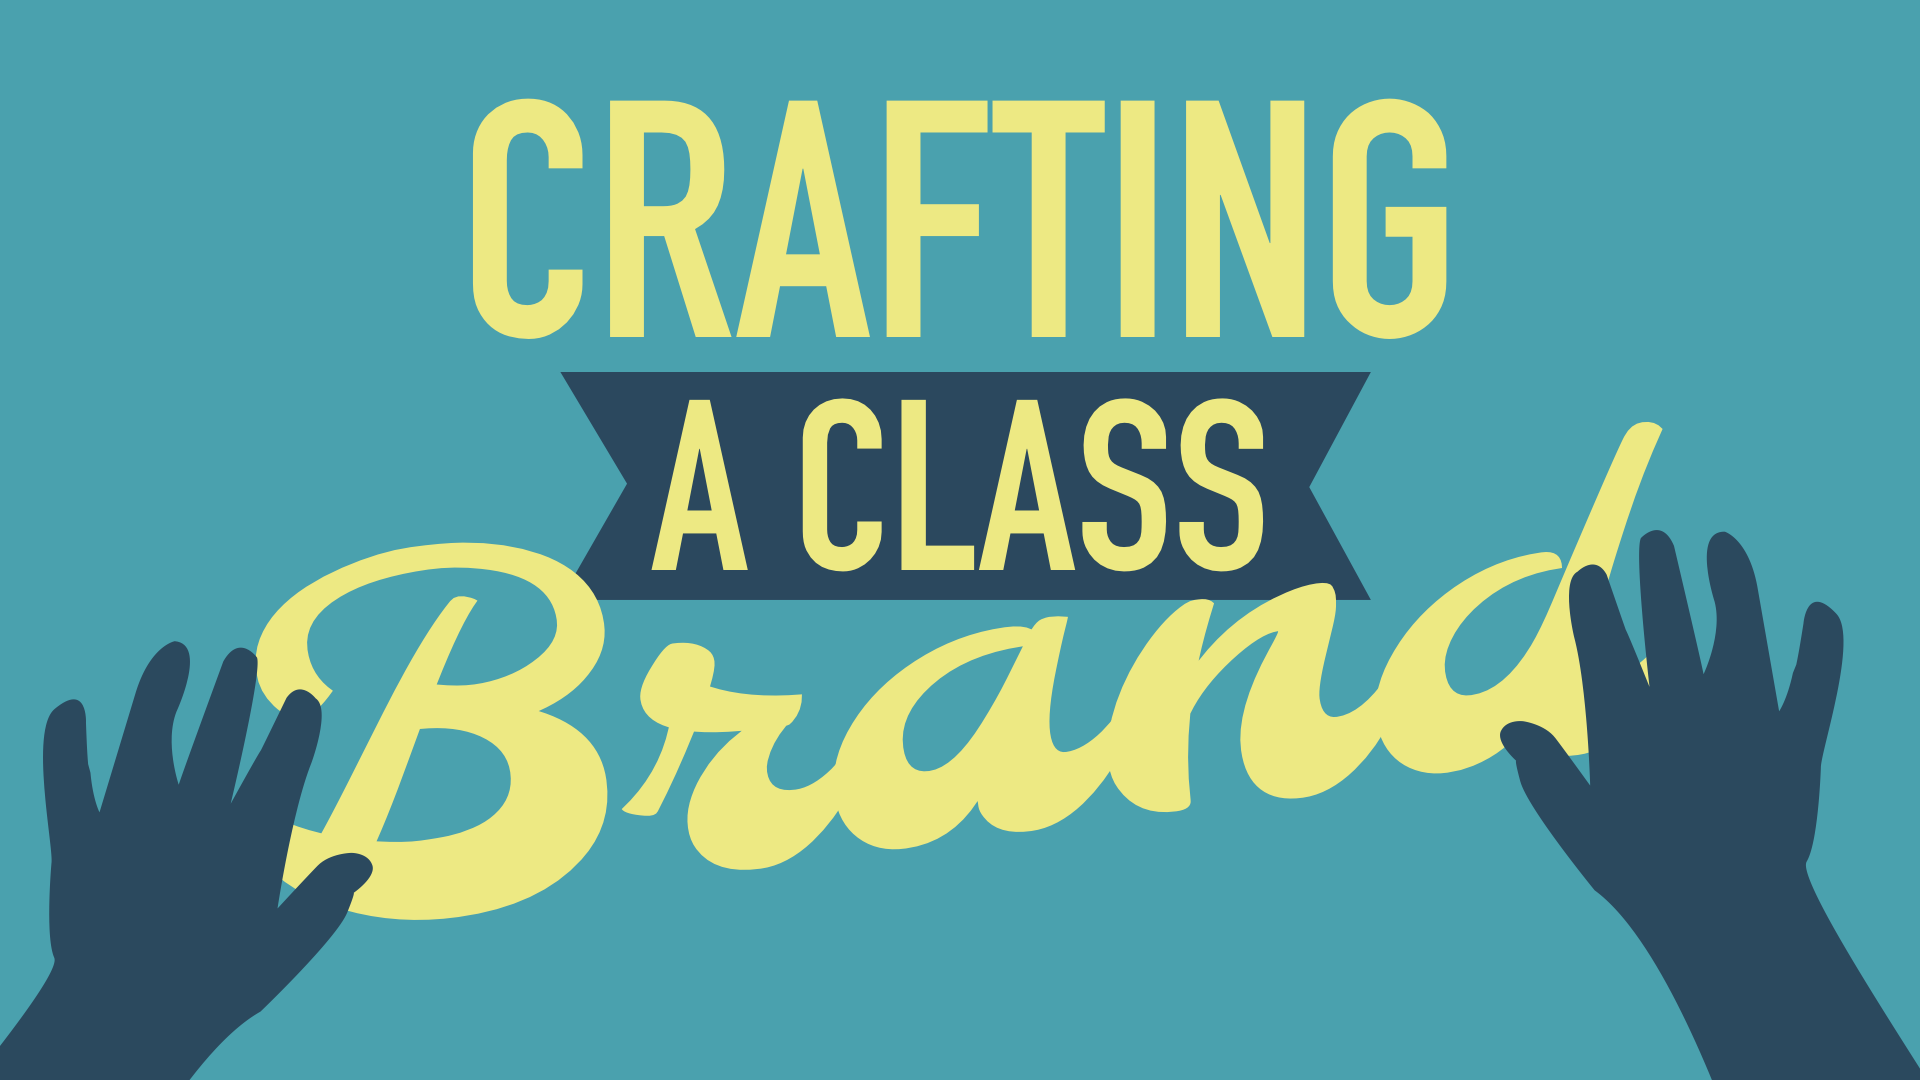 Crafting a Class Brand